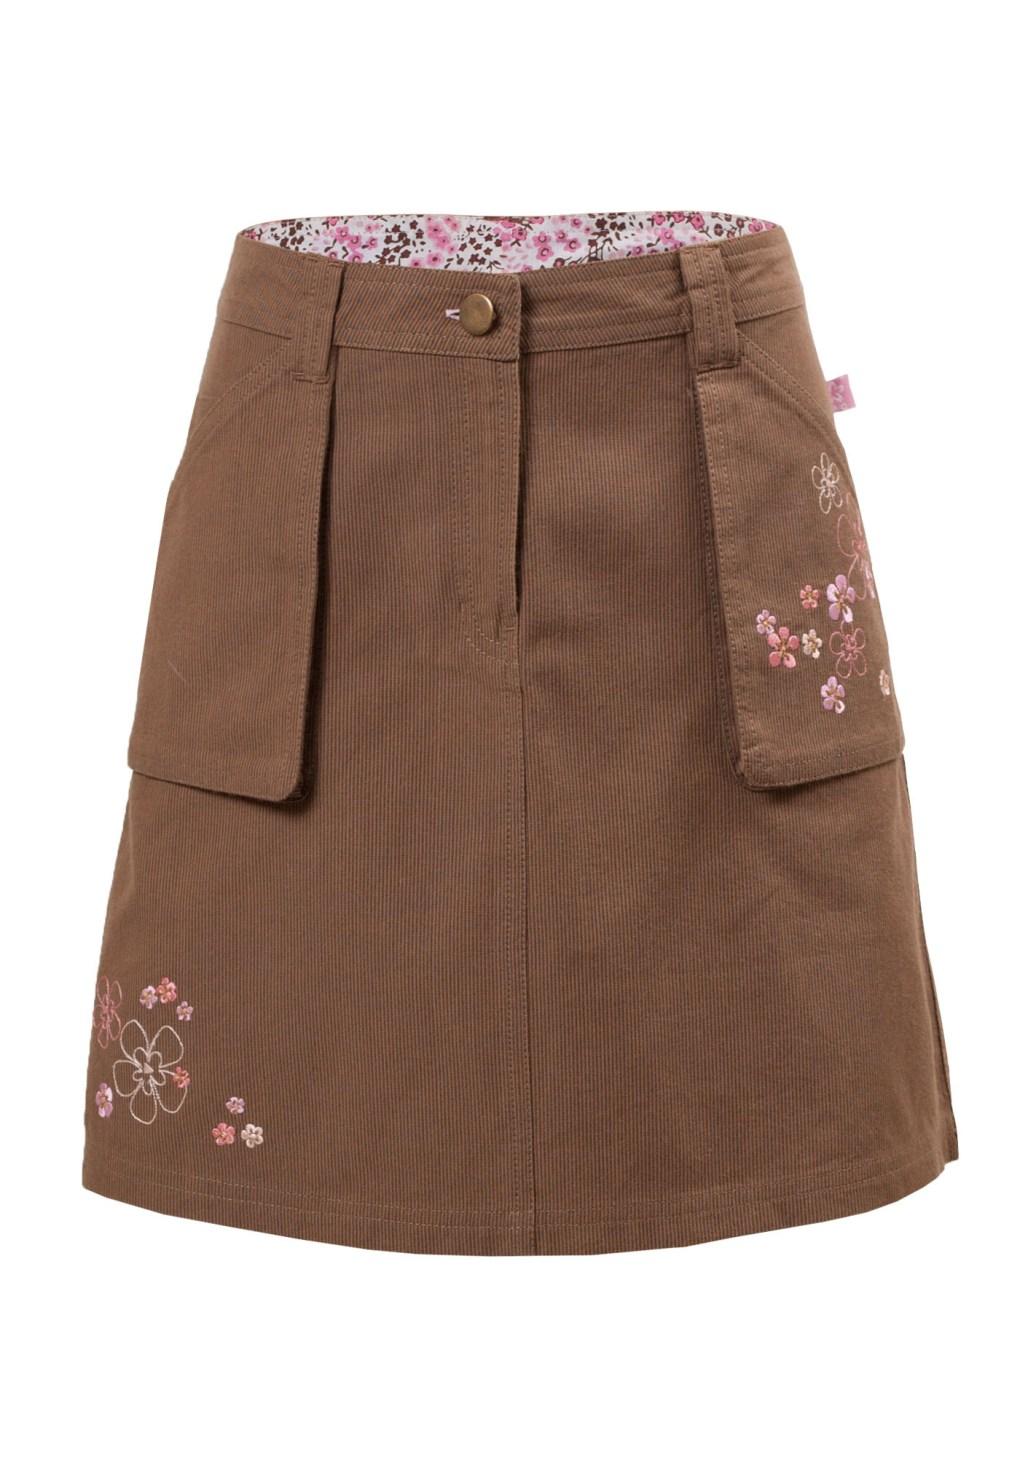 MINC Petite Autumn Fun Girls Embroidered Short Skirt in Brown Corduroy